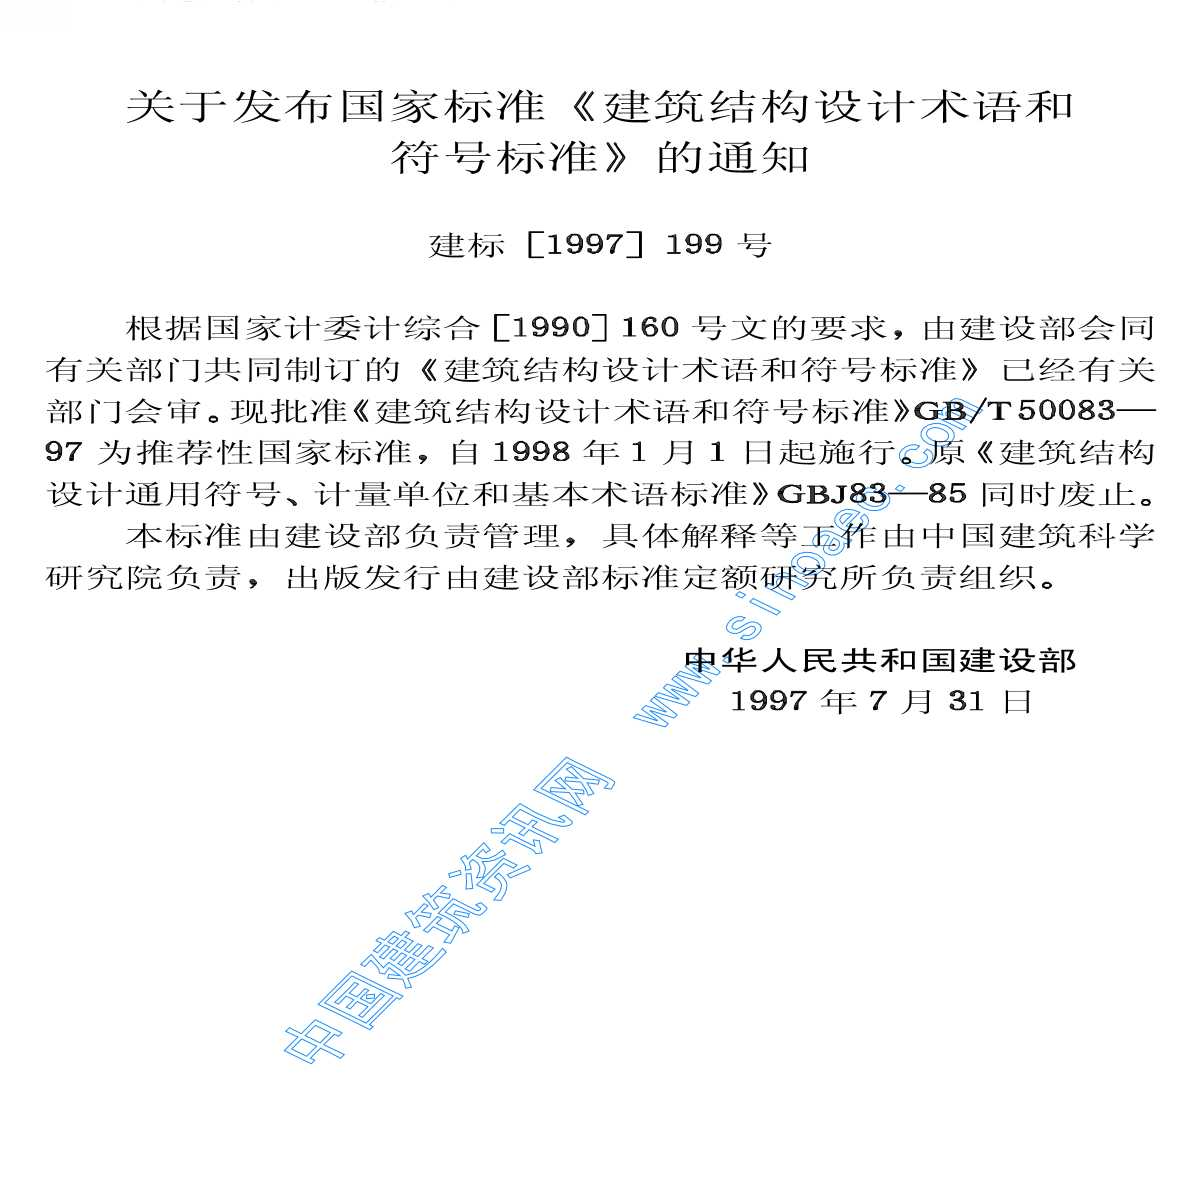 GBT50083-97建筑结构设计标准和符号字体湘西术语设计图片